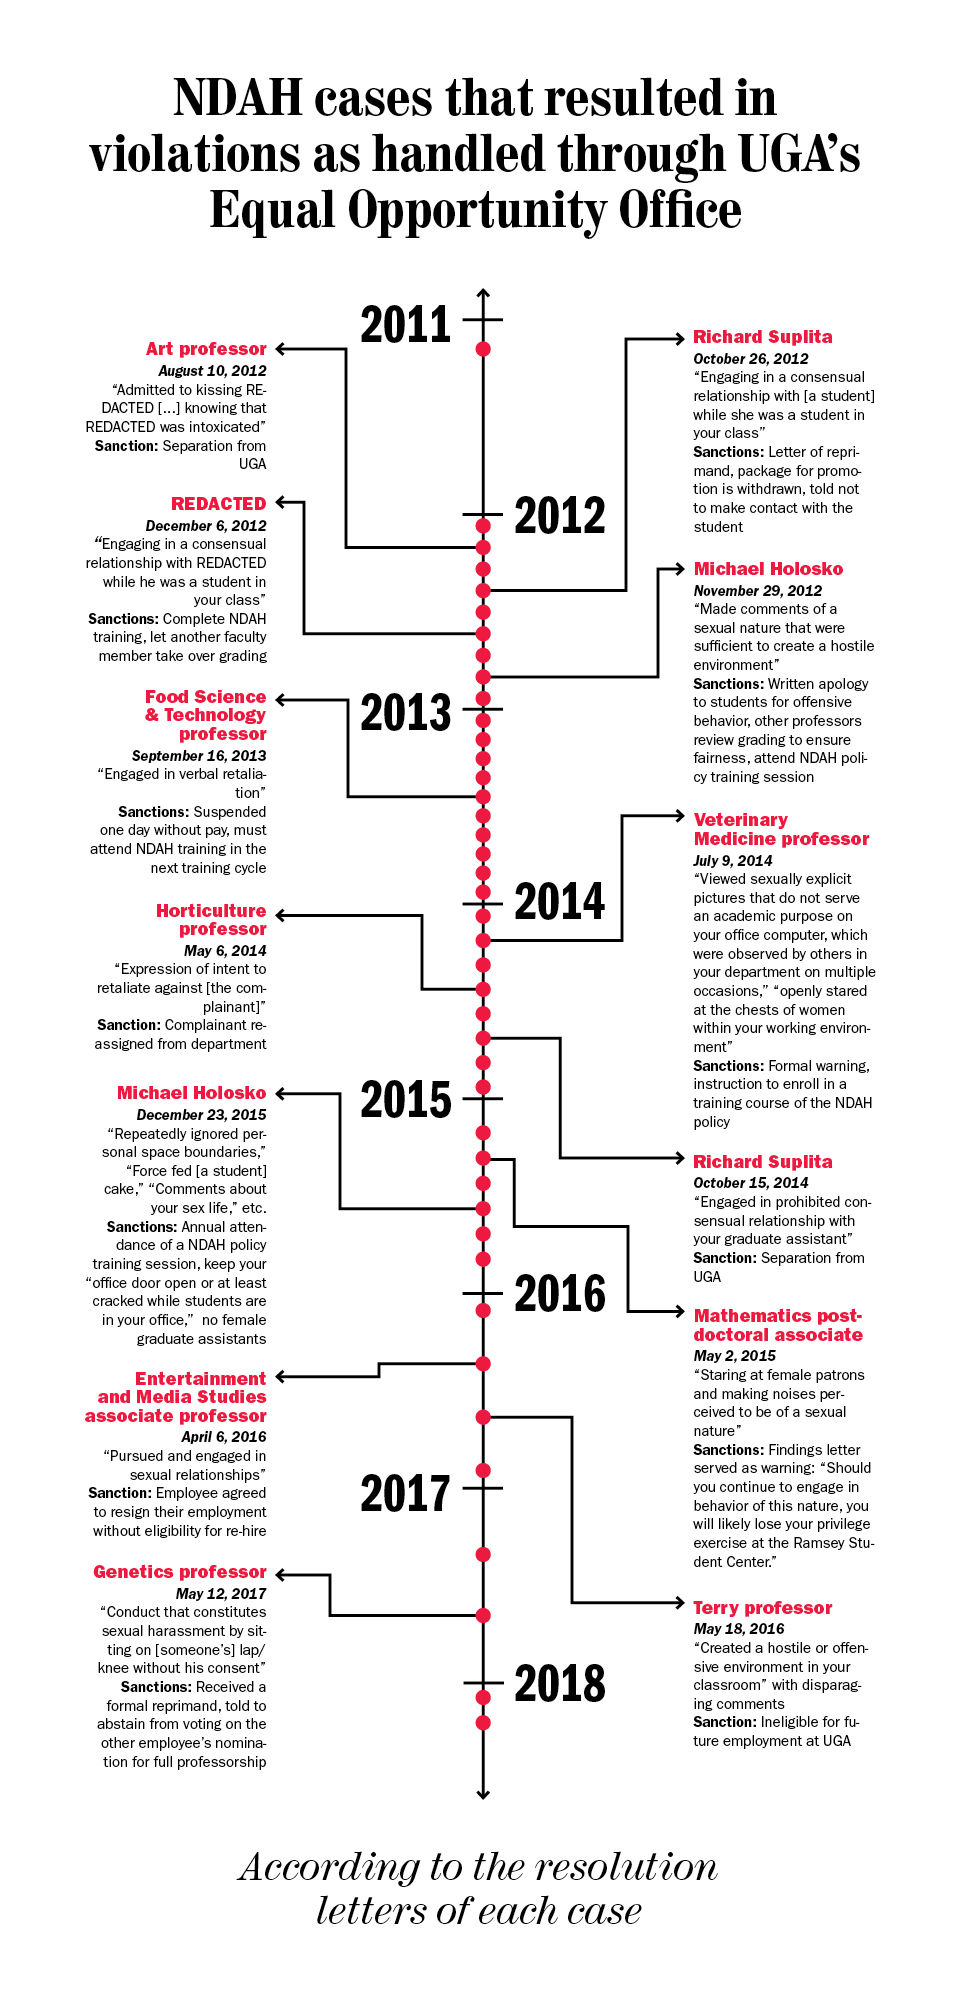 vertical NDAH timeline graphic